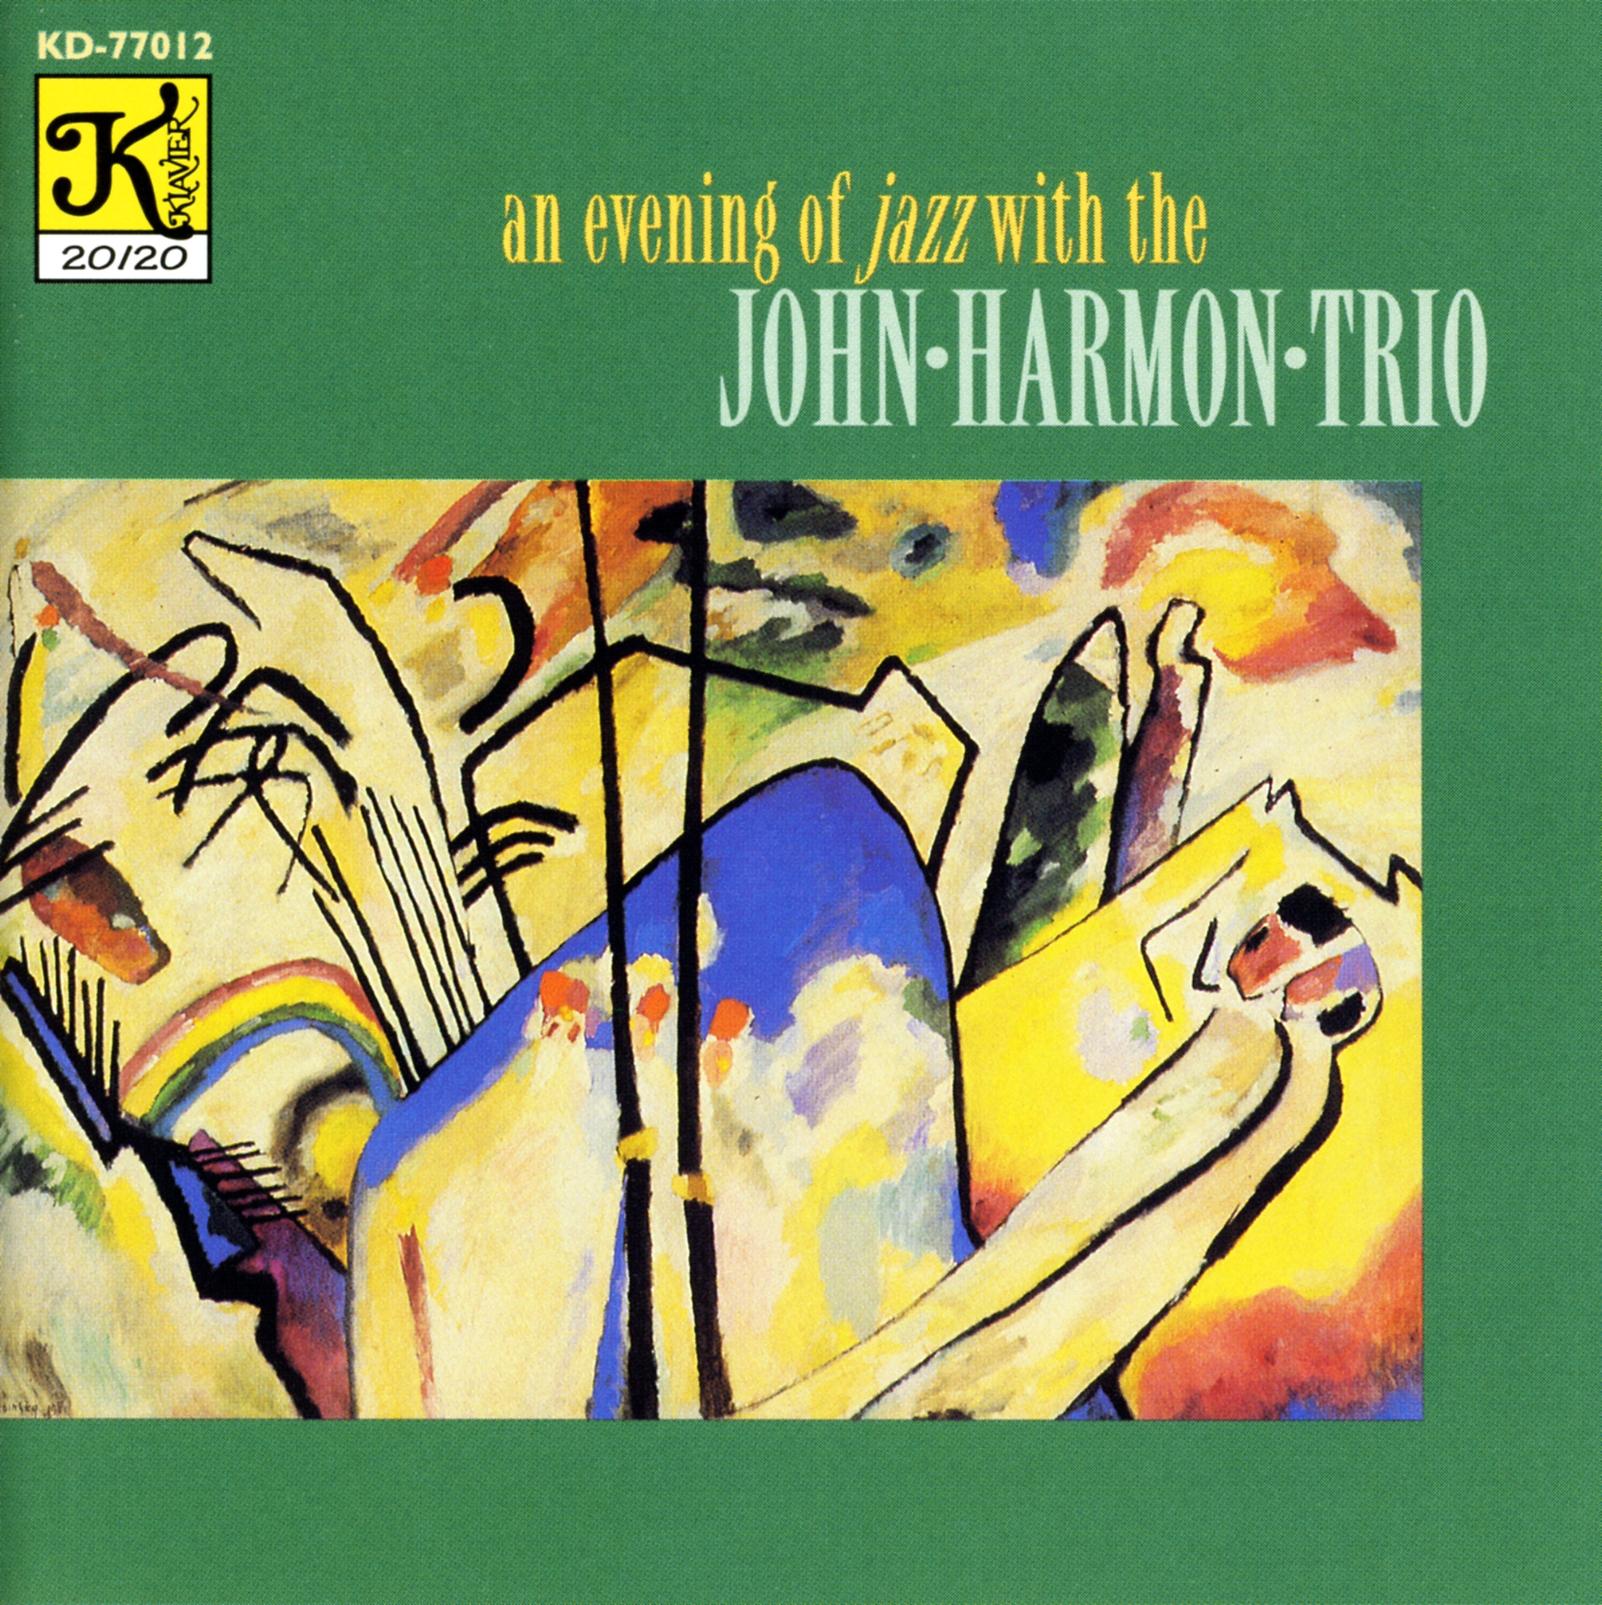 John Harmon Trio: Evening of Jazz With the John Harmon Trio (An)